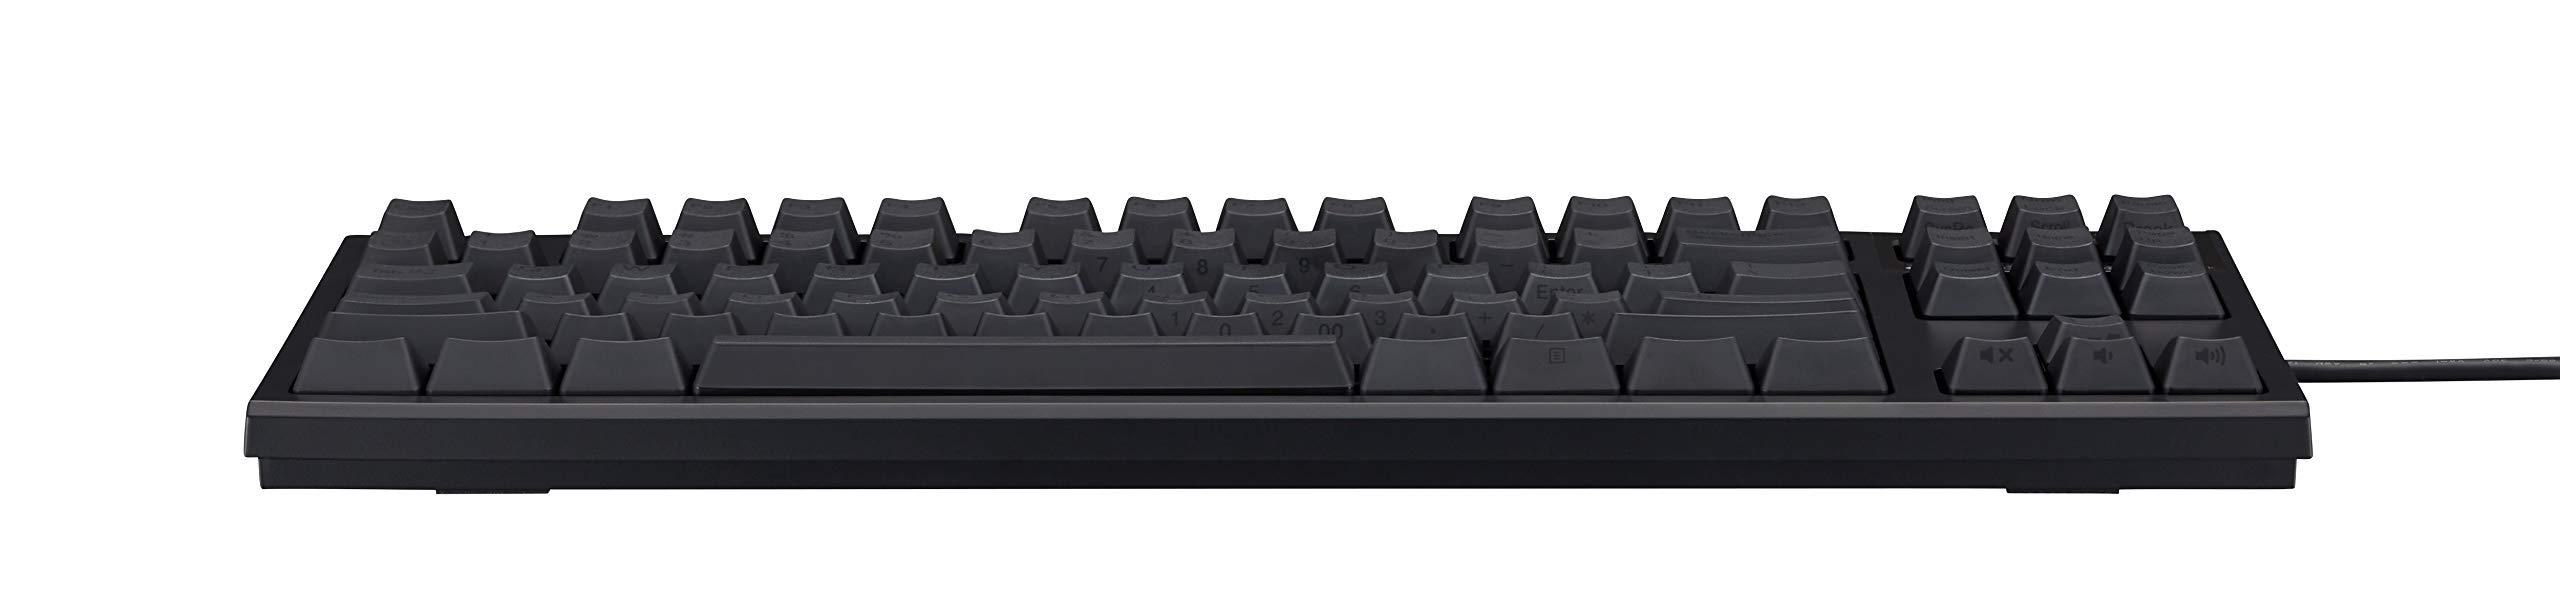 REALFORCE R2 PFU Limited Edition Keyboard (Mid, Black, 45G) by Fujitsu (Image #2)